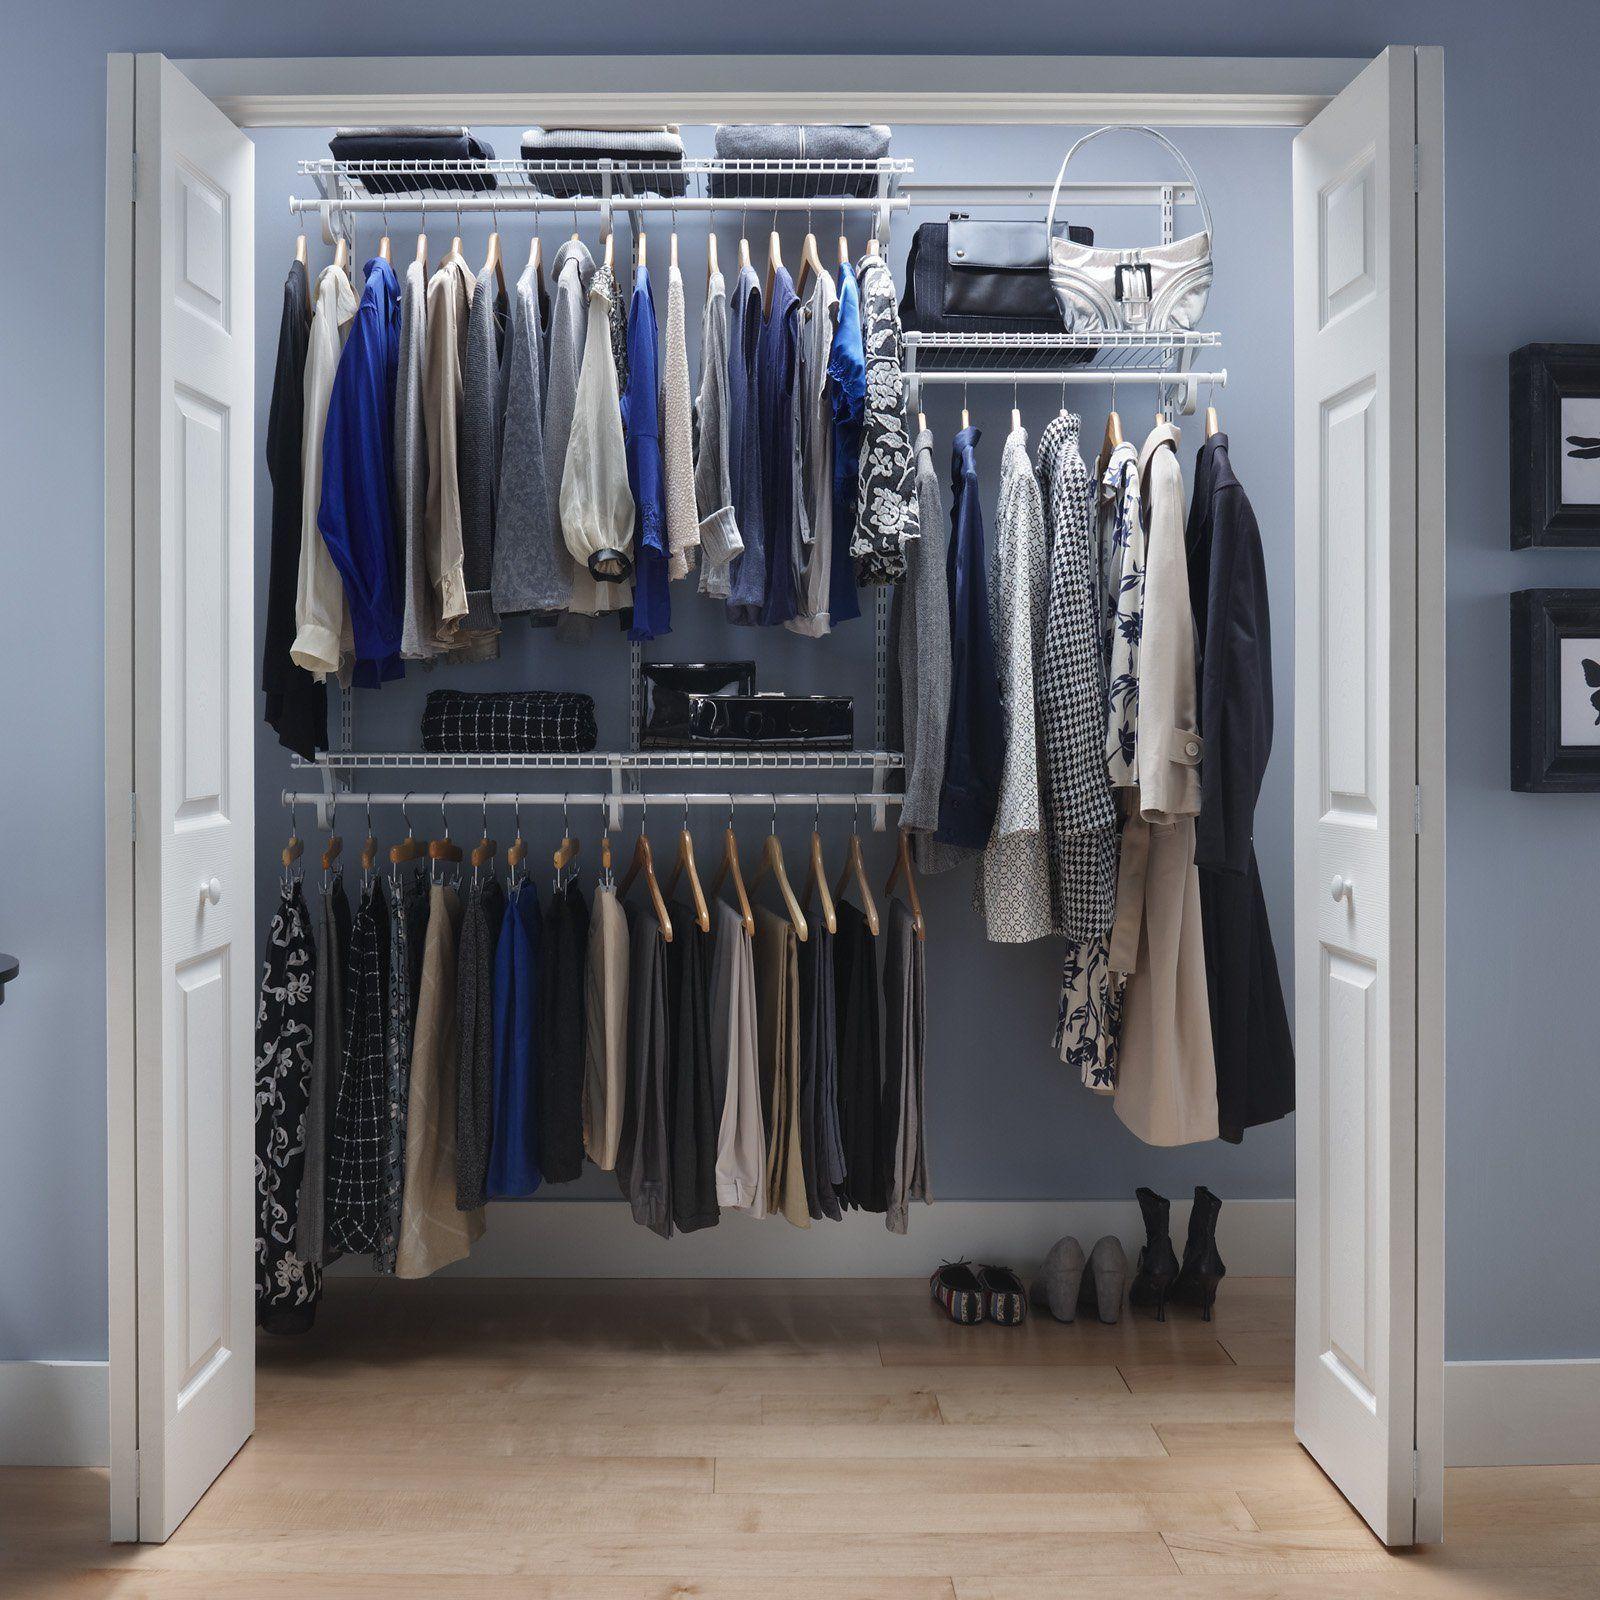 ClosetMaid ShelfTrack 4 6 Ft. Closet Organizer Kit   2873